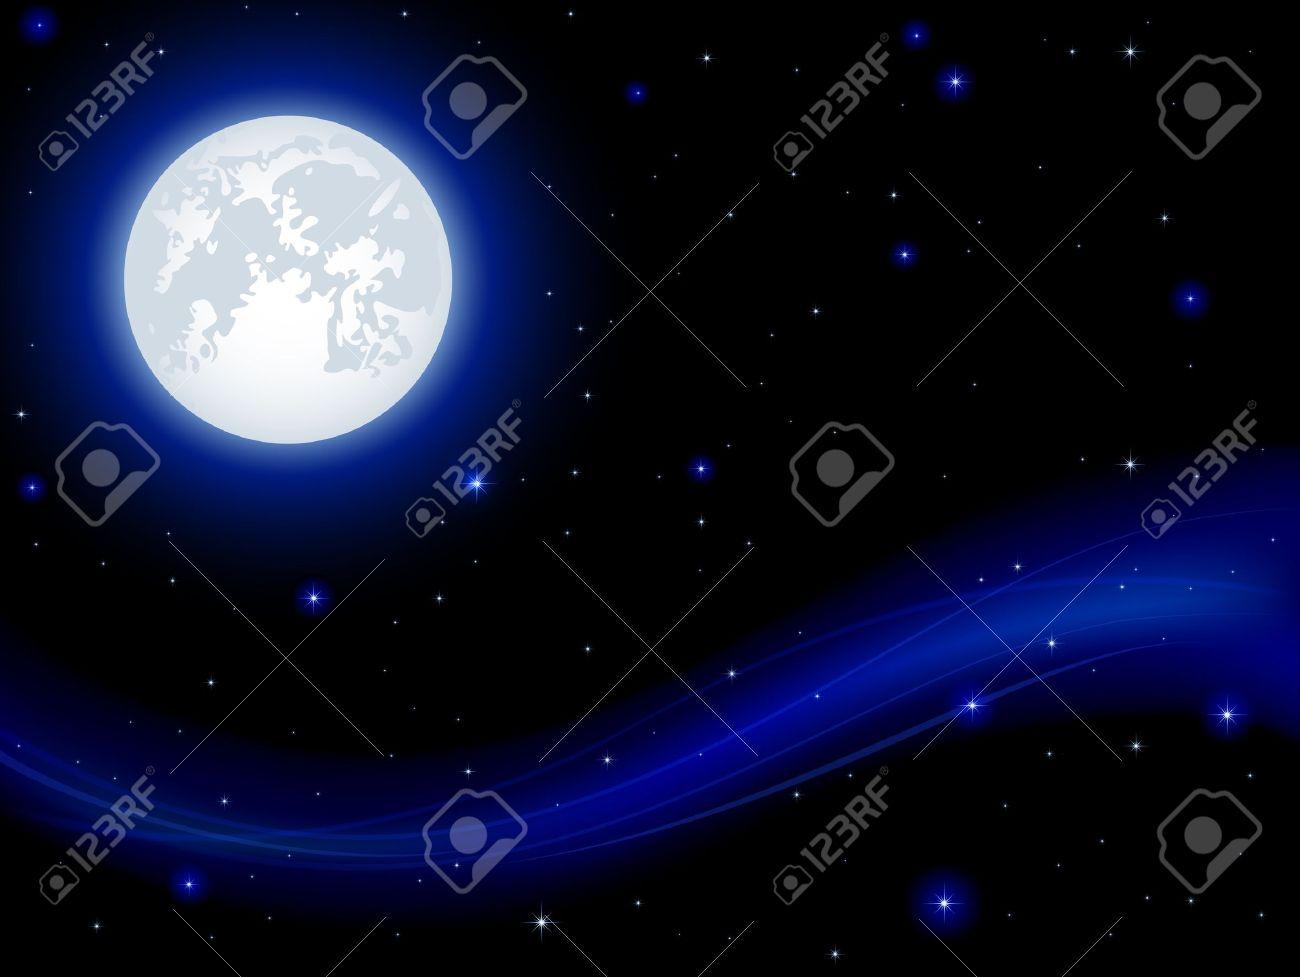 Night background, shining Stars and Moon on dark blue sky, illustration Stock Vector - 14886957